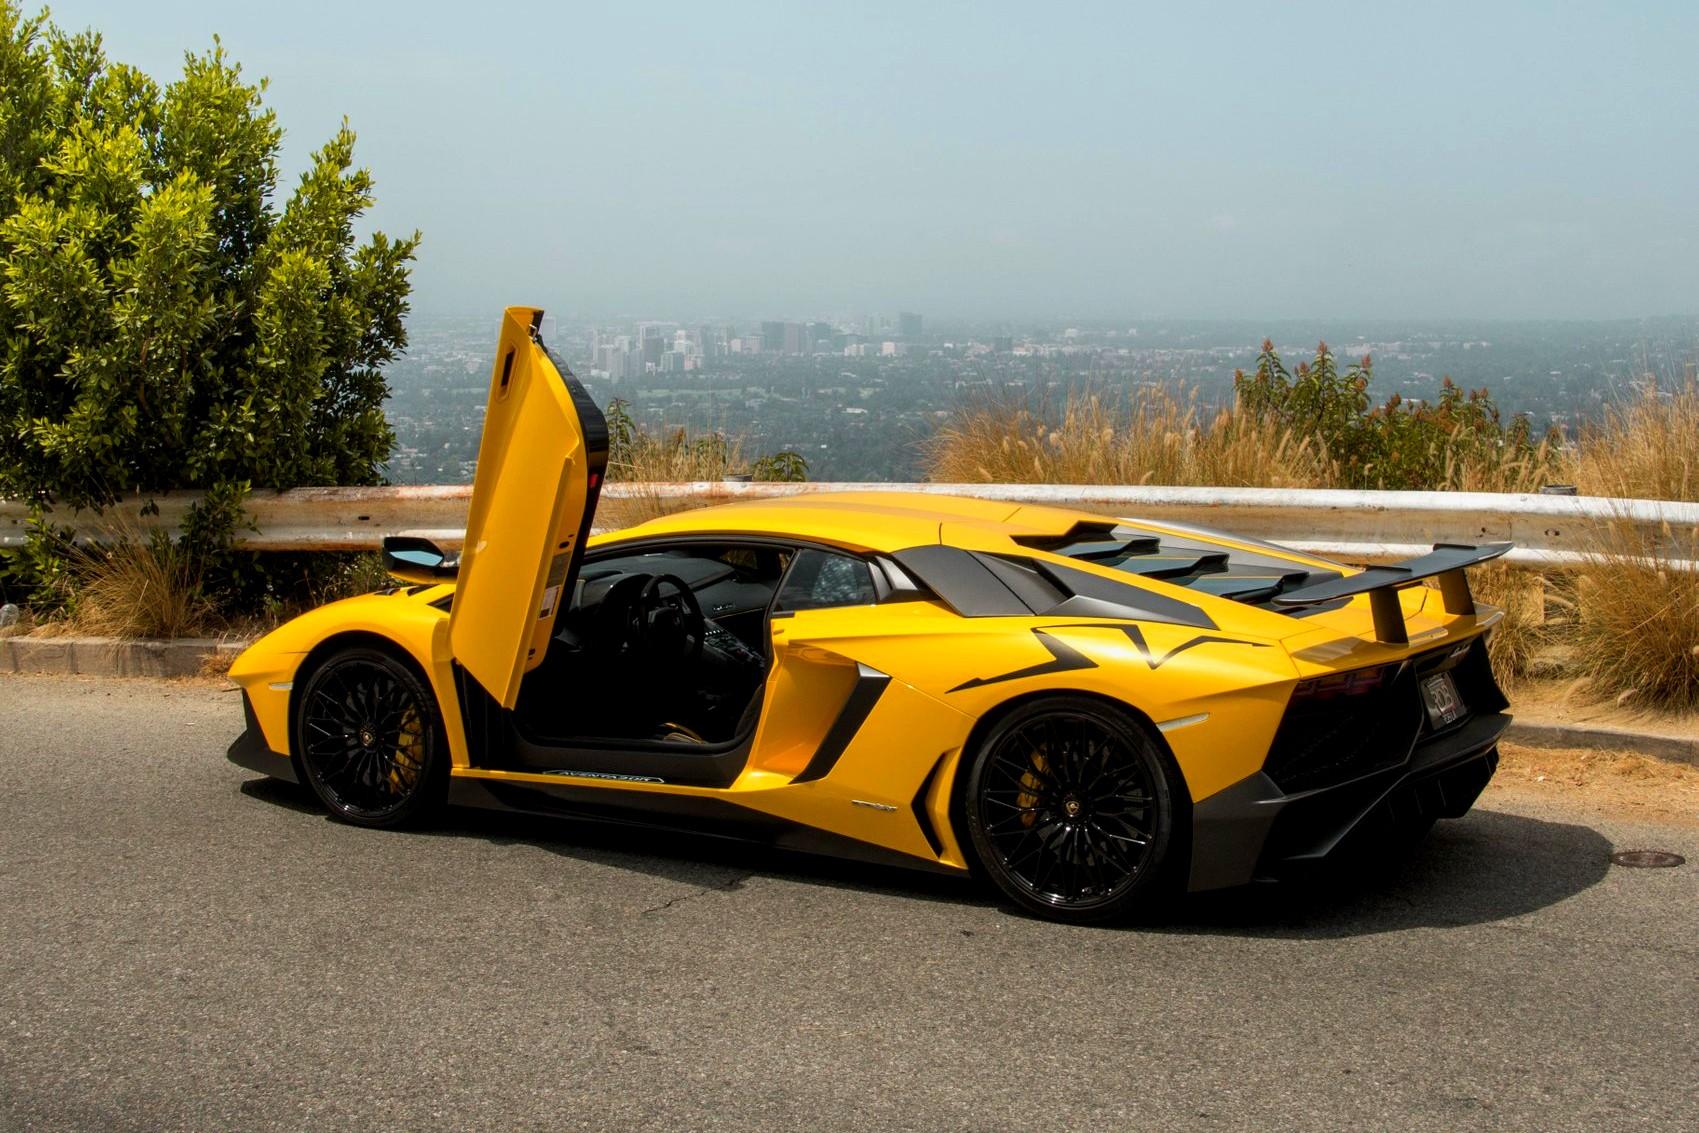 Best exotic cars warranty: 2016 Lamborghini Aventador SVJ, West Hollywood , CA, USA, $385,000.